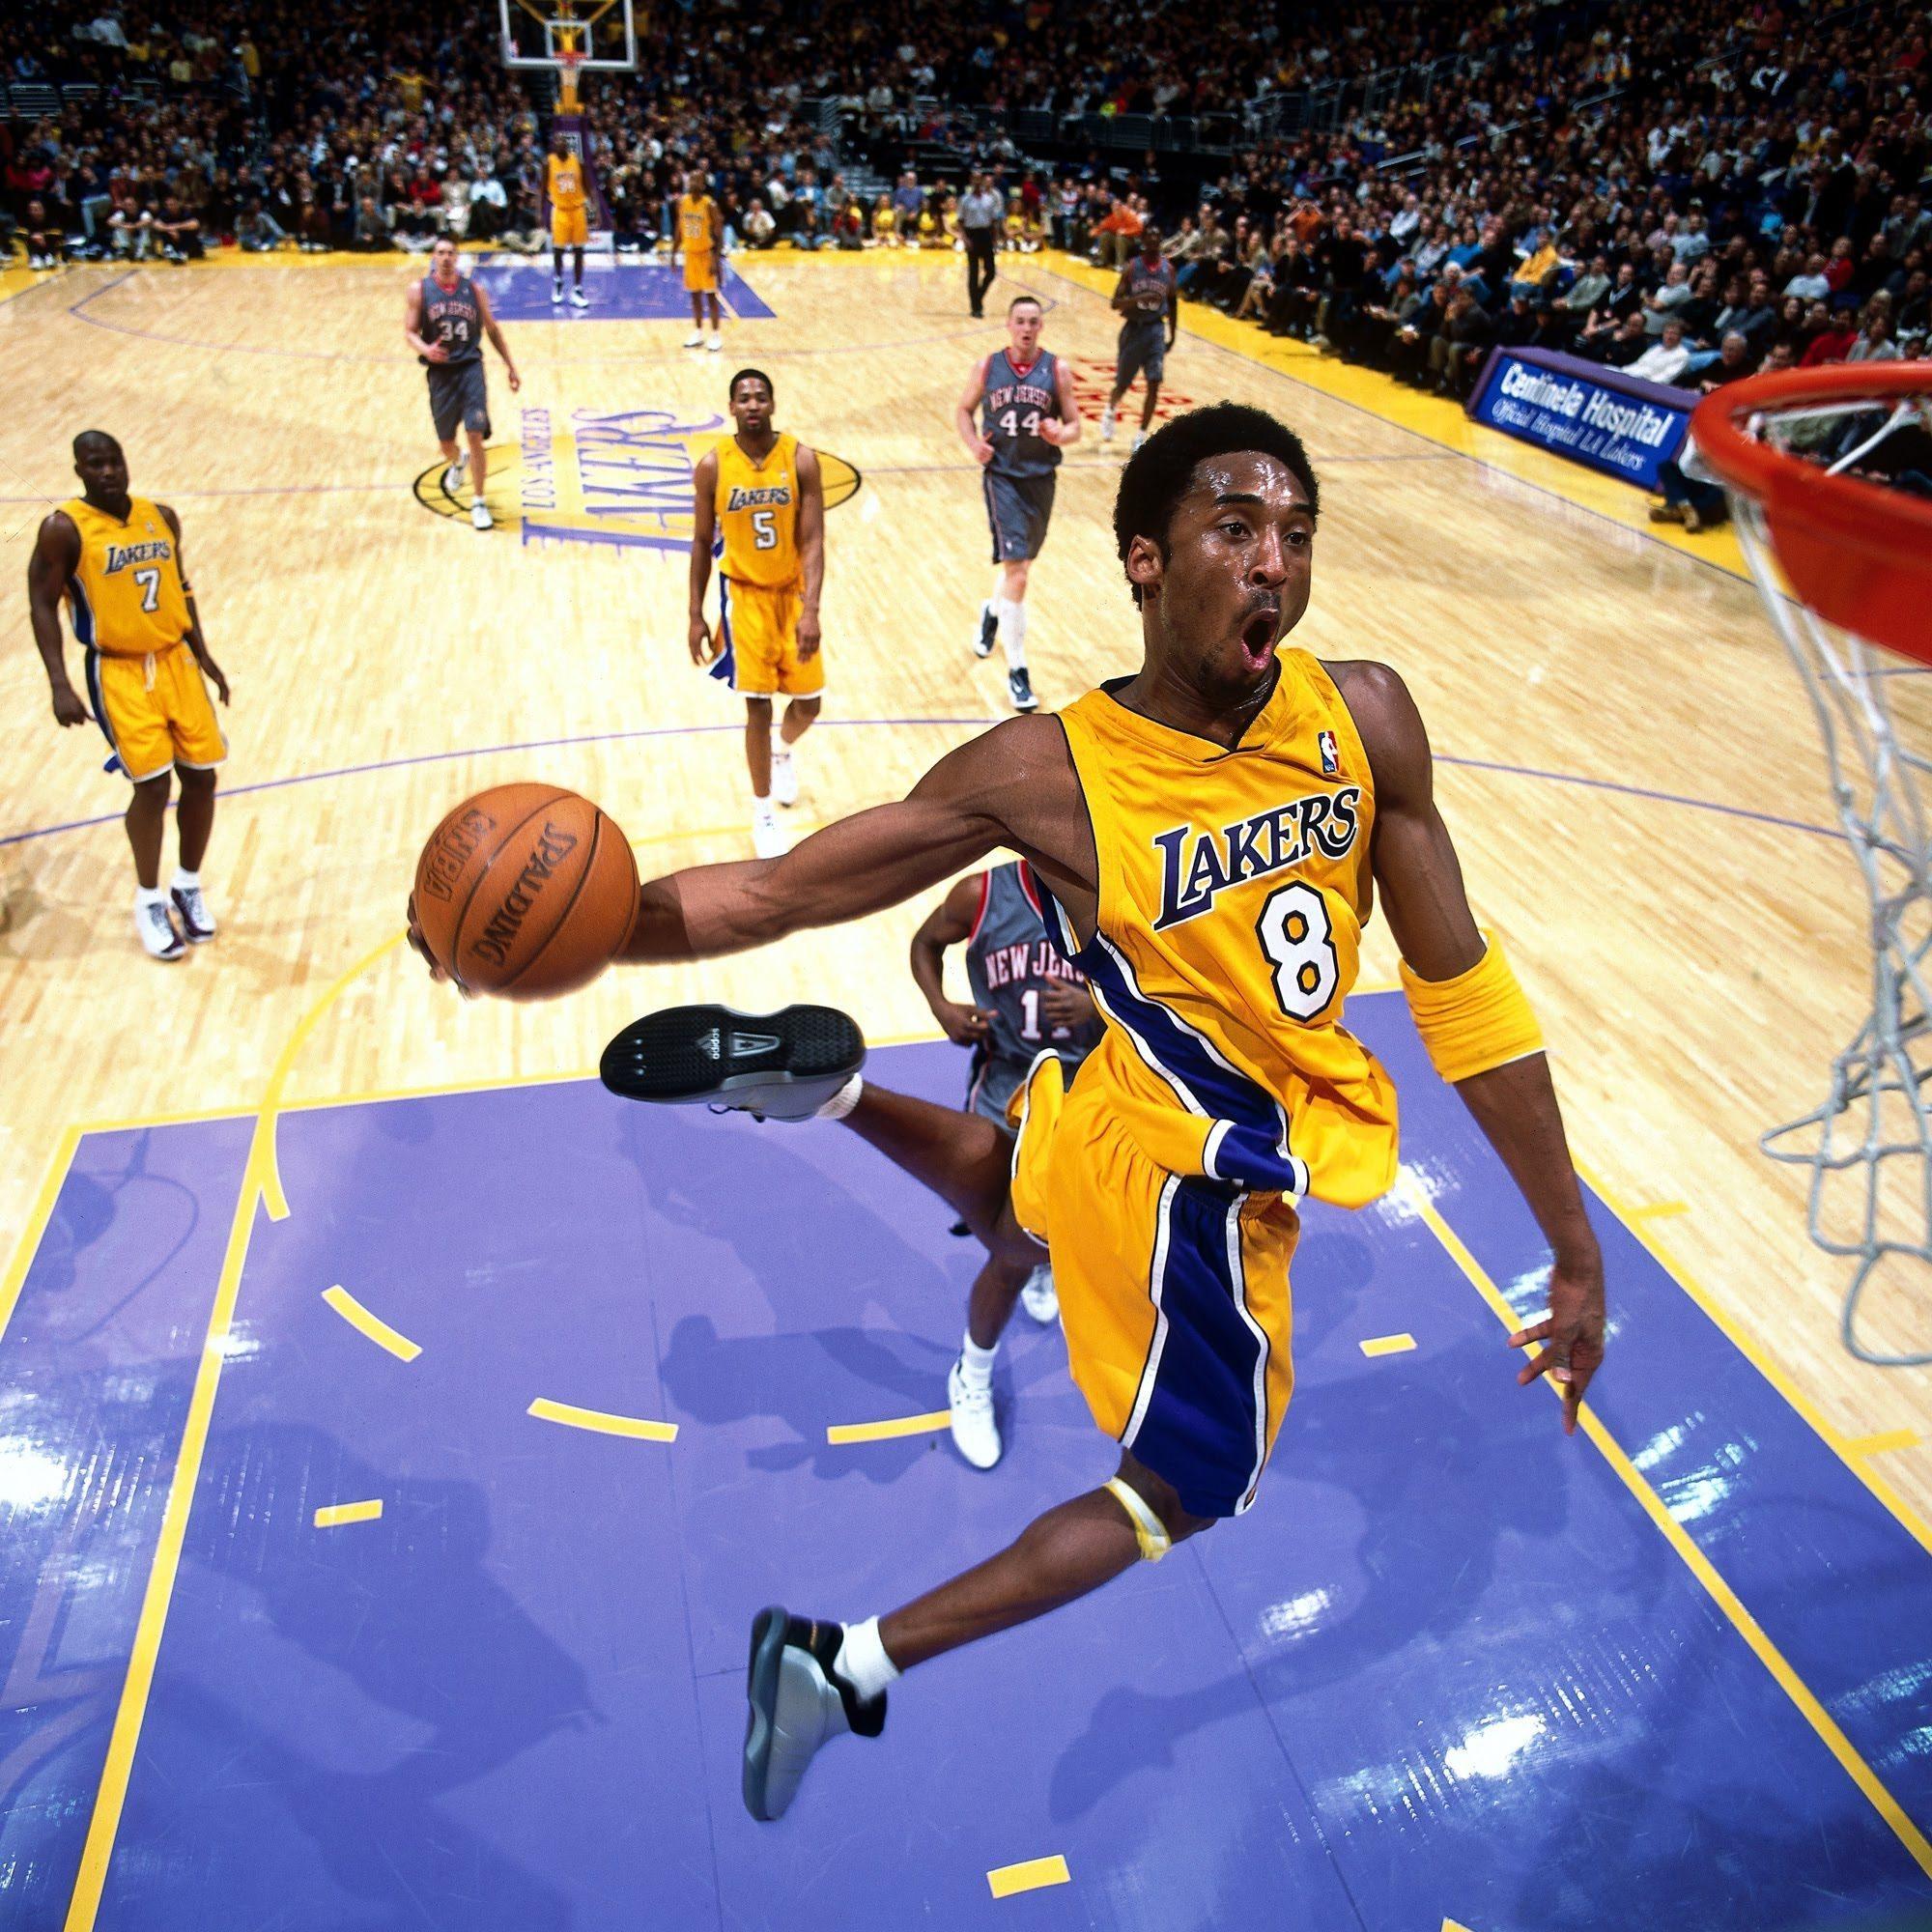 Kobe Bryant What year did he retire 2016